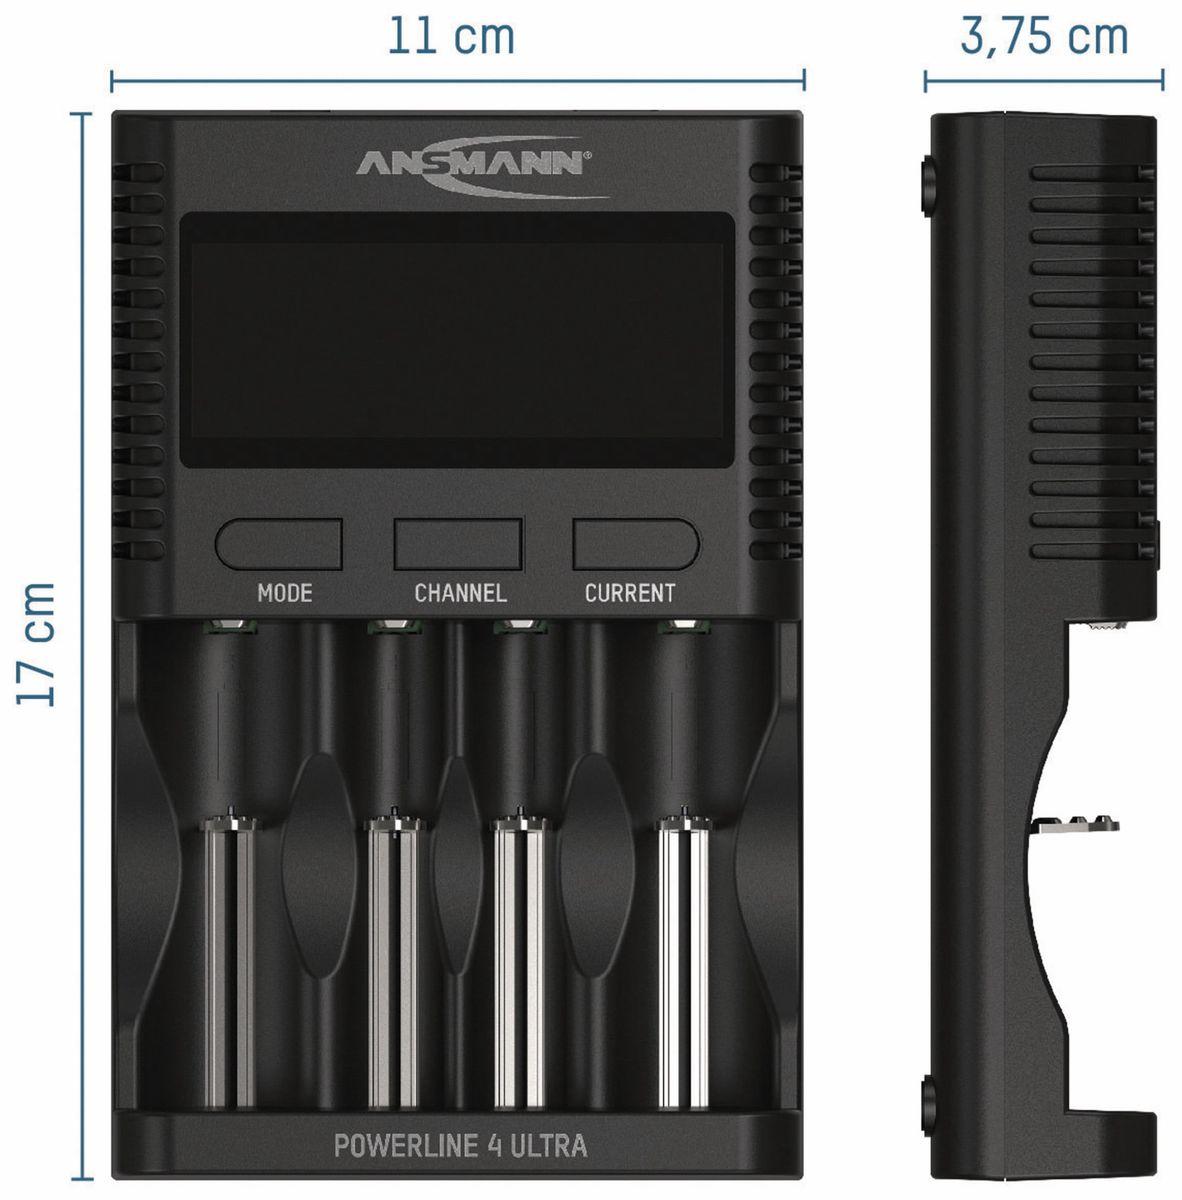 Ladegerät ANSMANN Powerline 4 Ultra online kaufen | Pollin.at